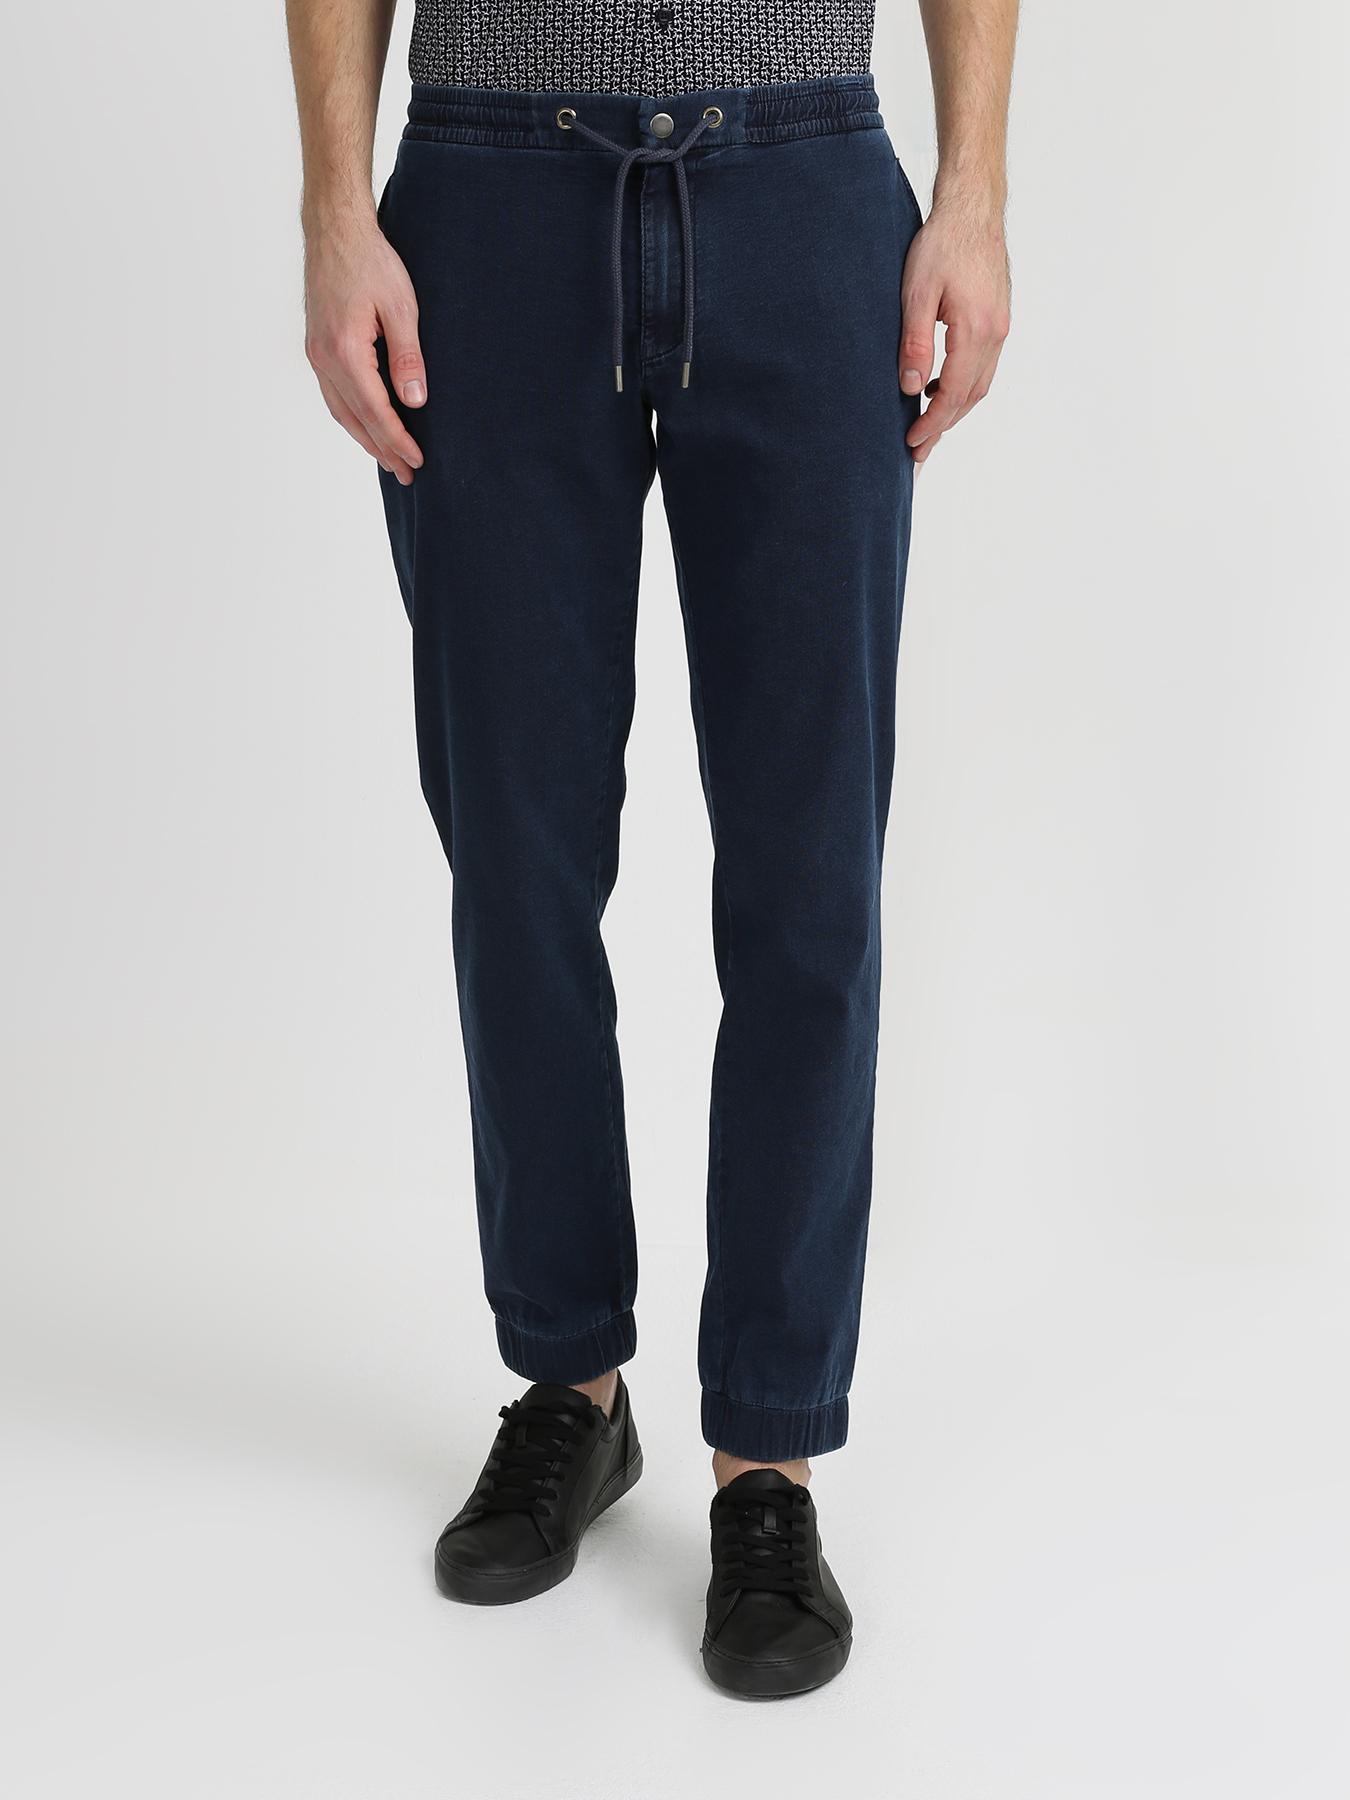 W. Wegener Брюки брюки w wegener брюки